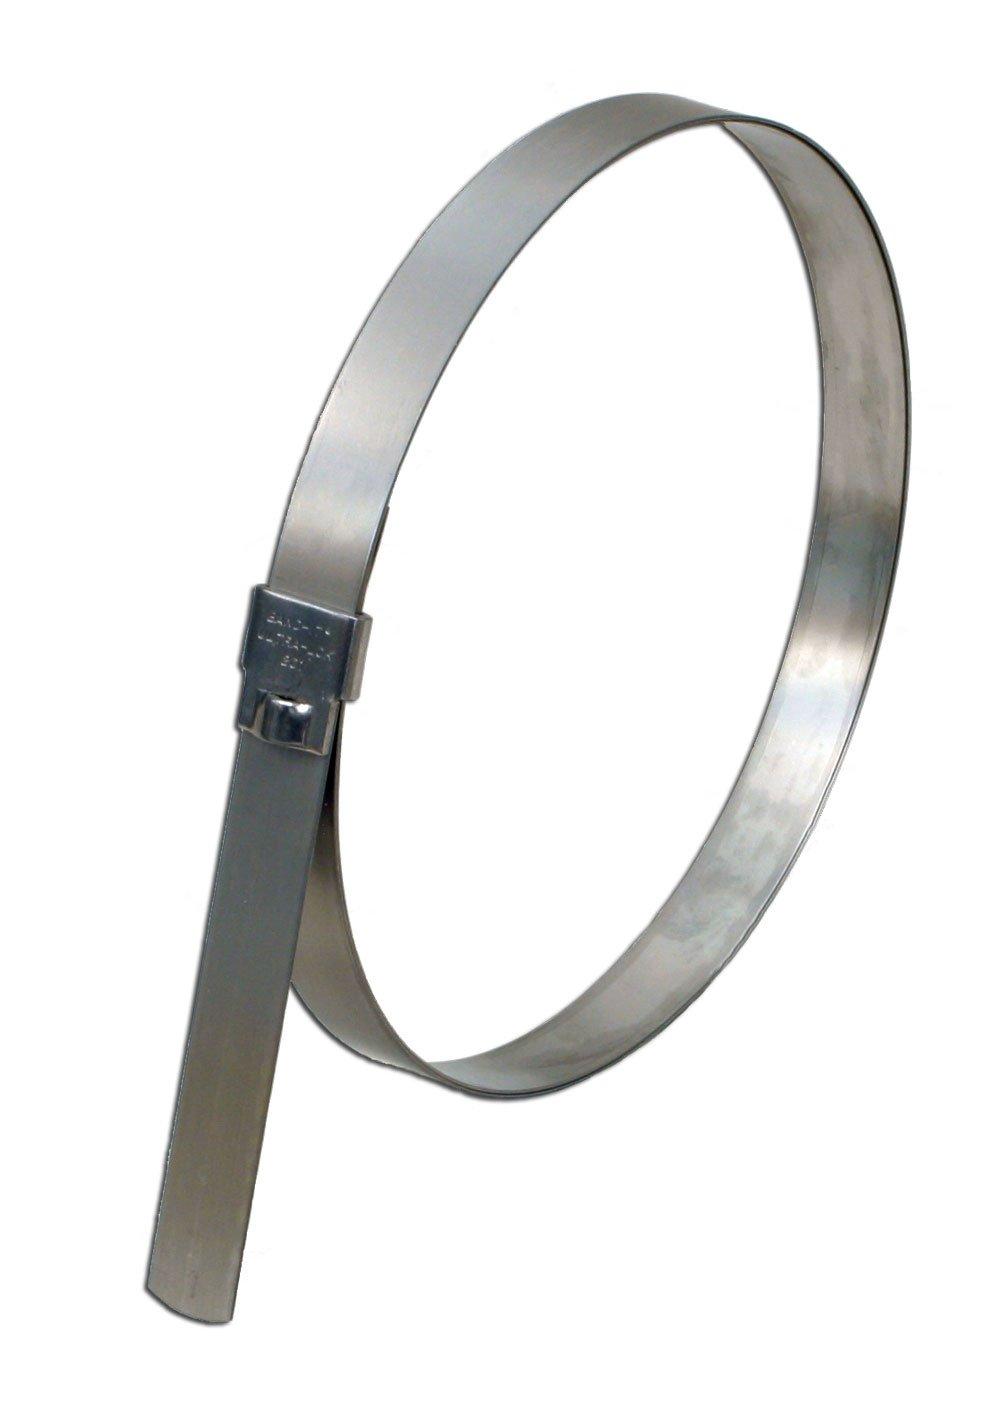 7 Diameter 7 Diameter BAND-IT UL2189 Ultra-Lok 3//4 Wide x 0.030 Thick 25 per box 201 1//4 Hard Stainless Steel Preformed Clamp